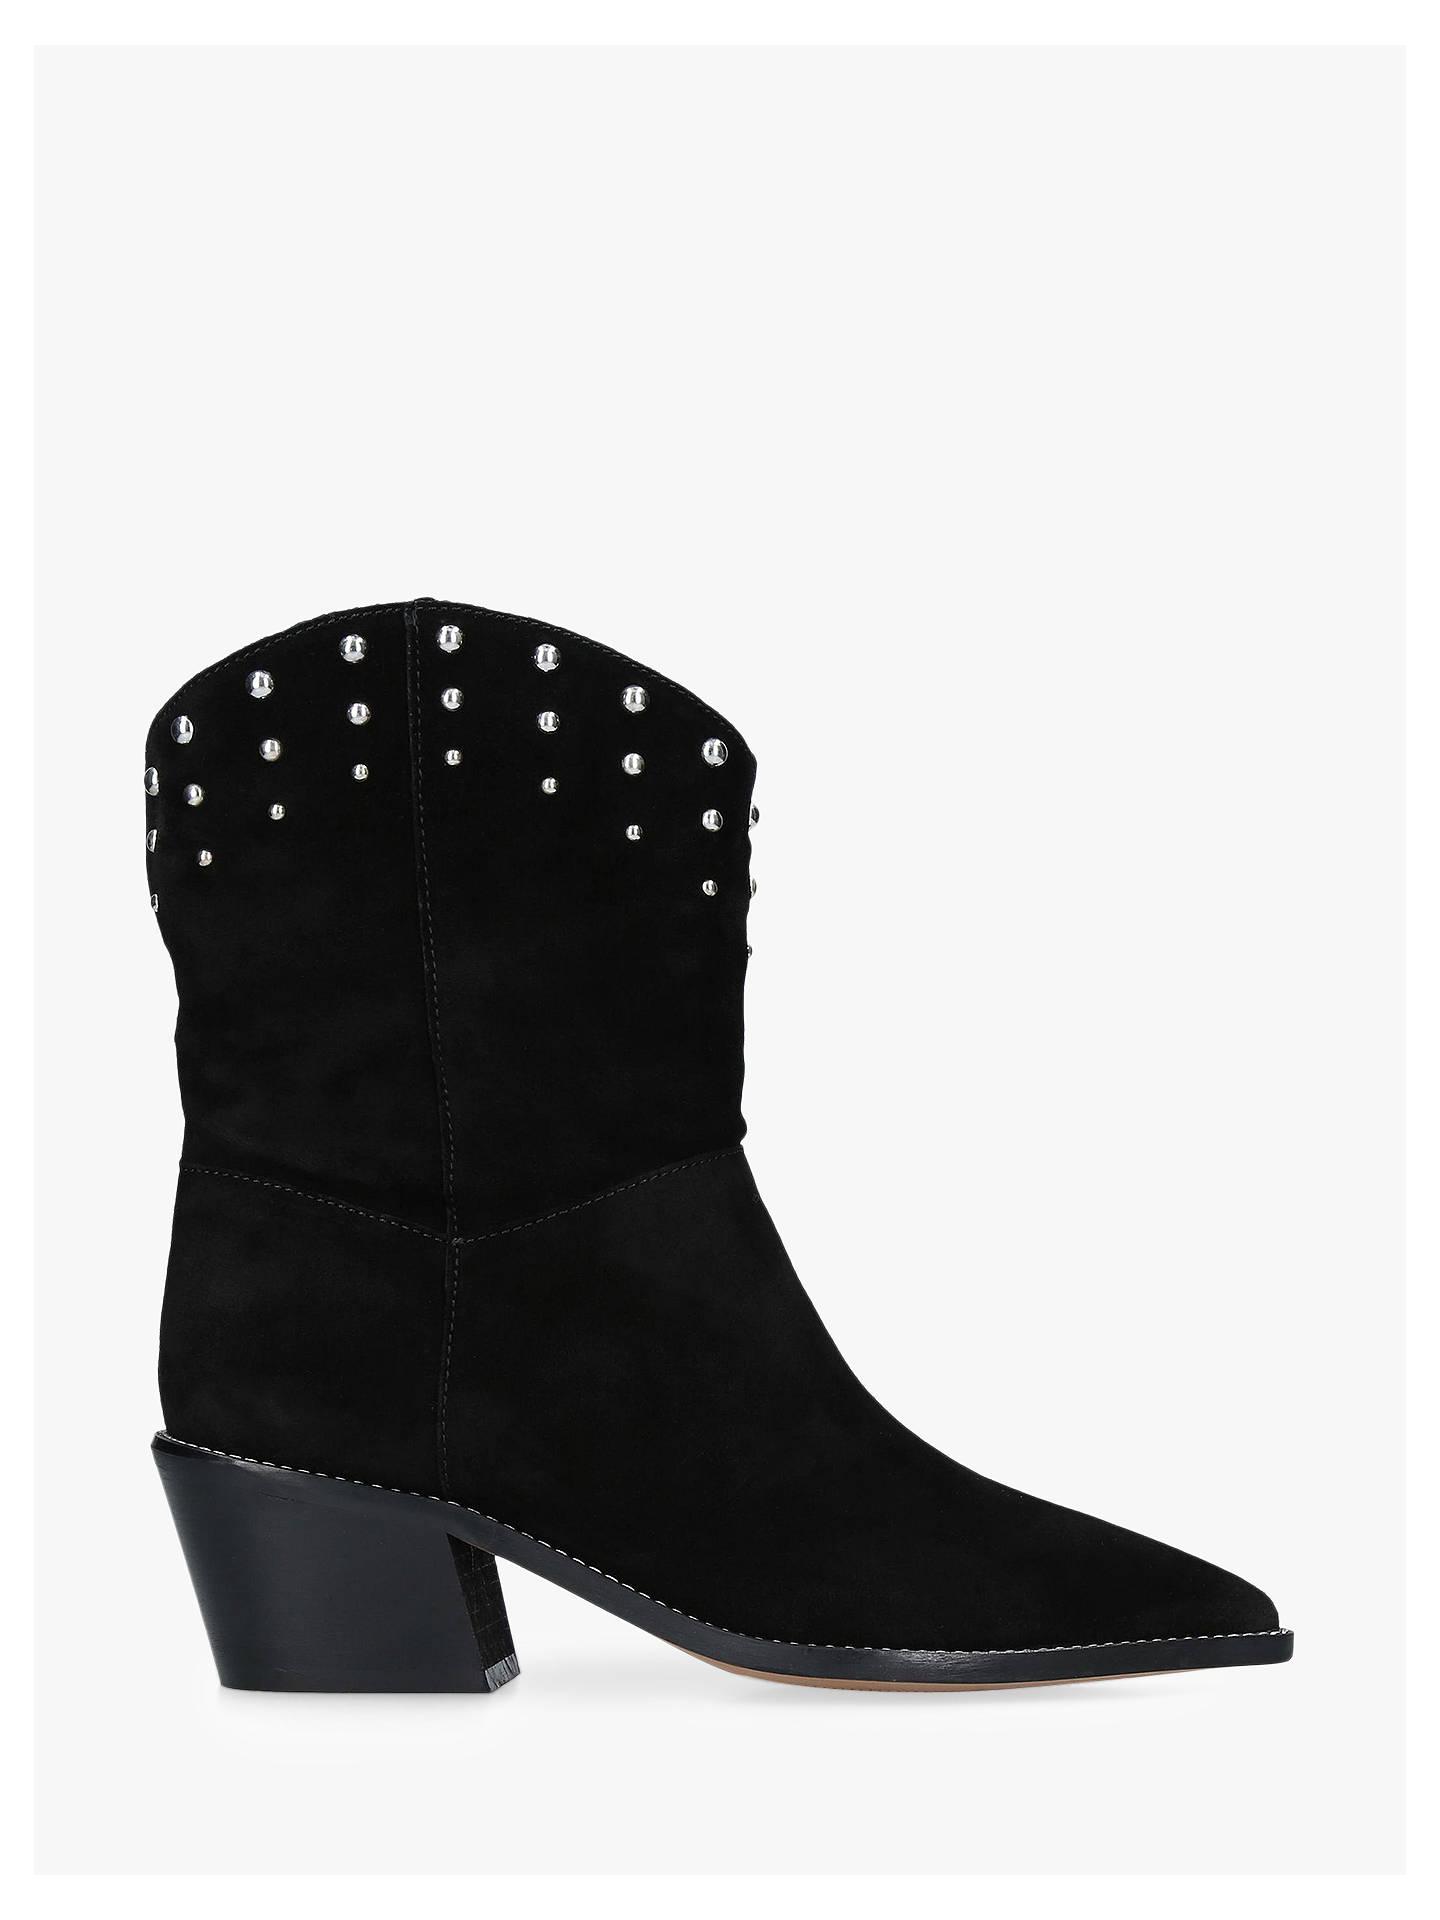 22b91ad056422 Buy Carvela Salt Block Heel Ankle Boots